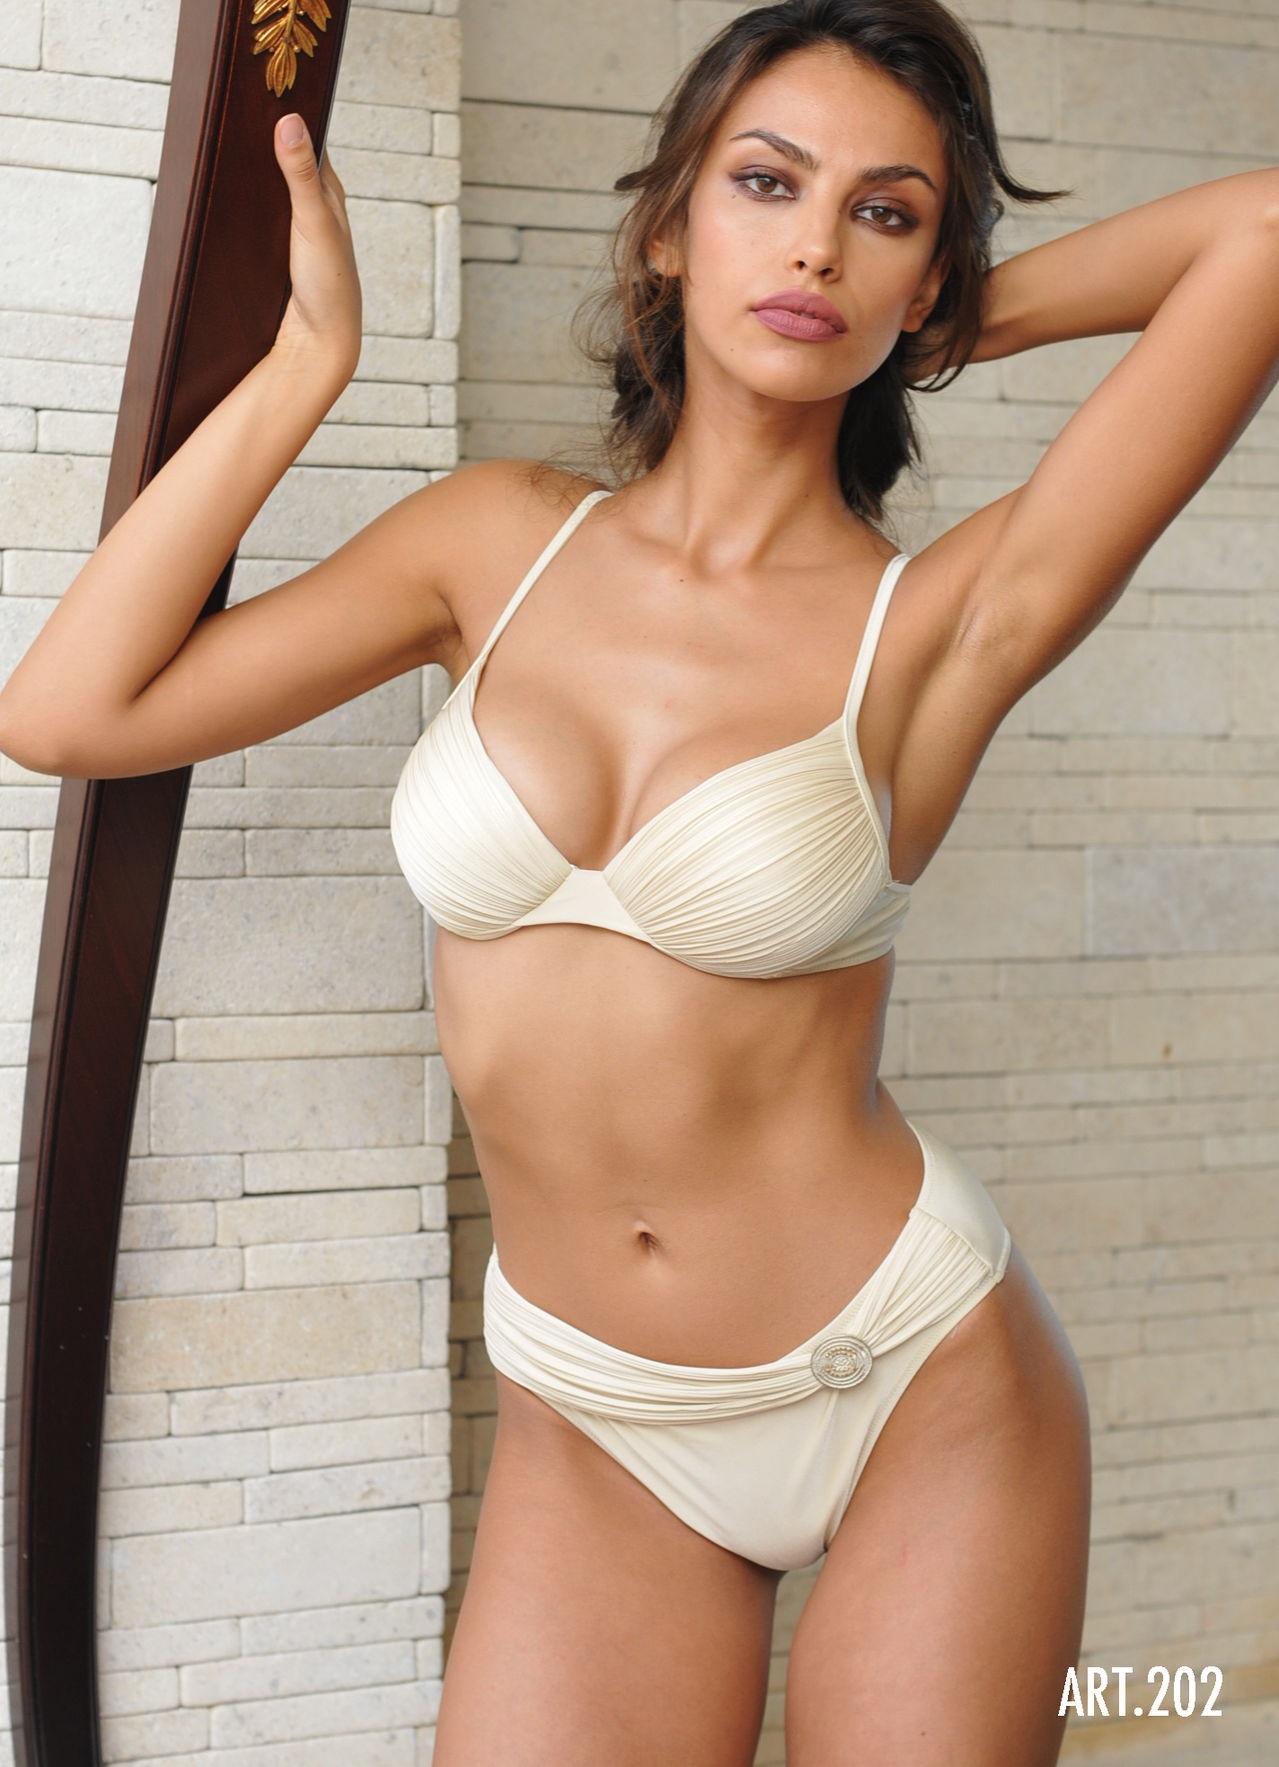 Bikini Madalina Diana Ghenea naked (29 photo), Pussy, Hot, Selfie, in bikini 2018